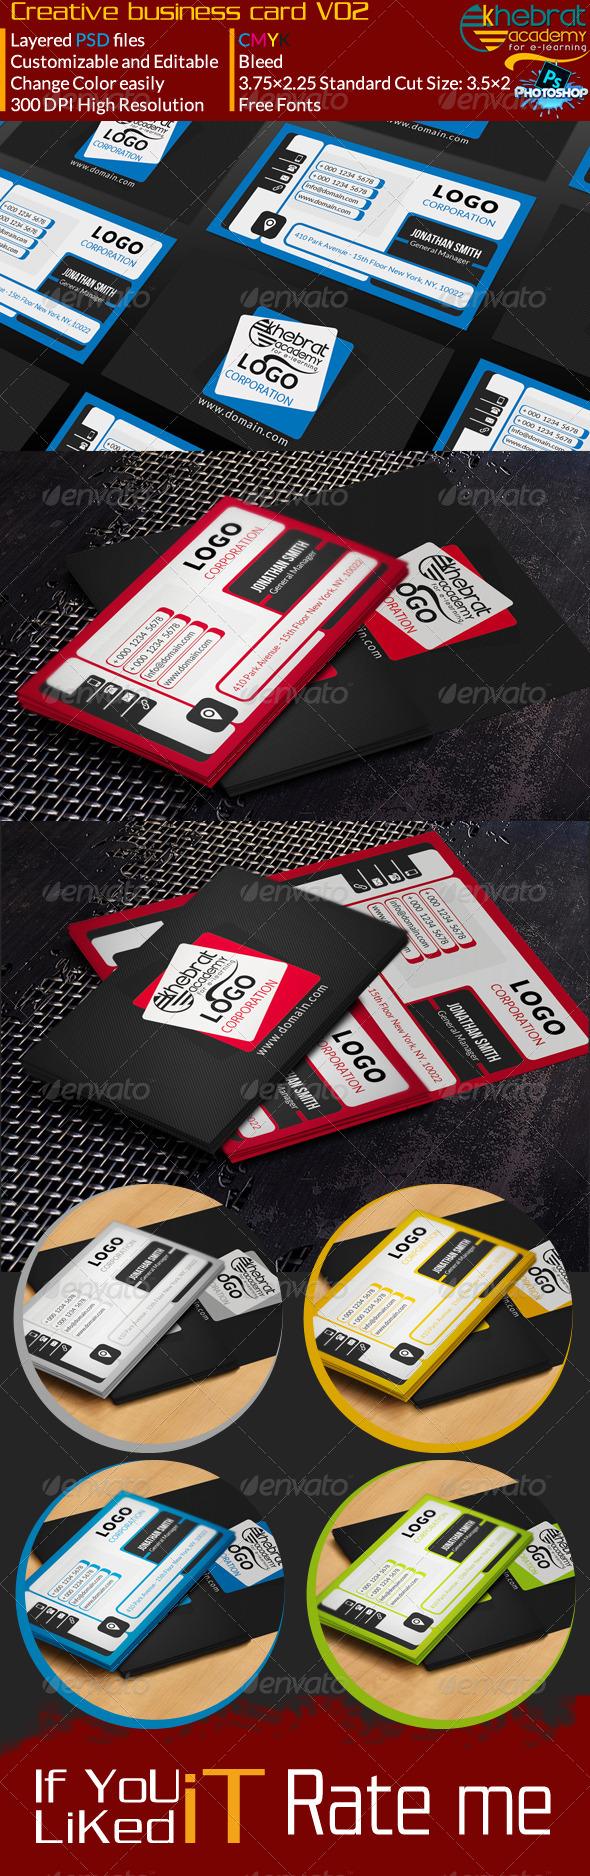 Creative Business Card V02 - Creative Business Cards